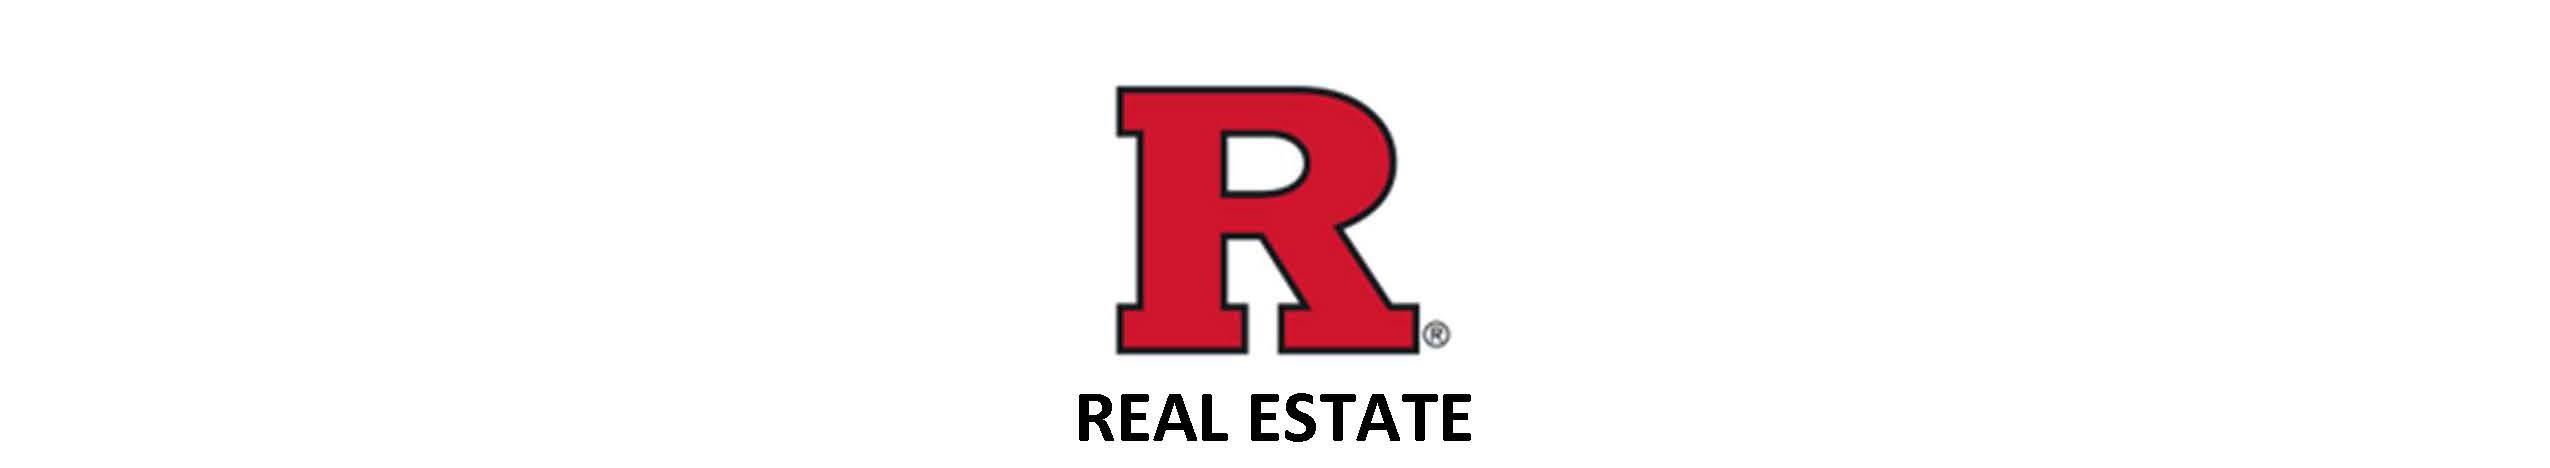 rutgers real estate logo